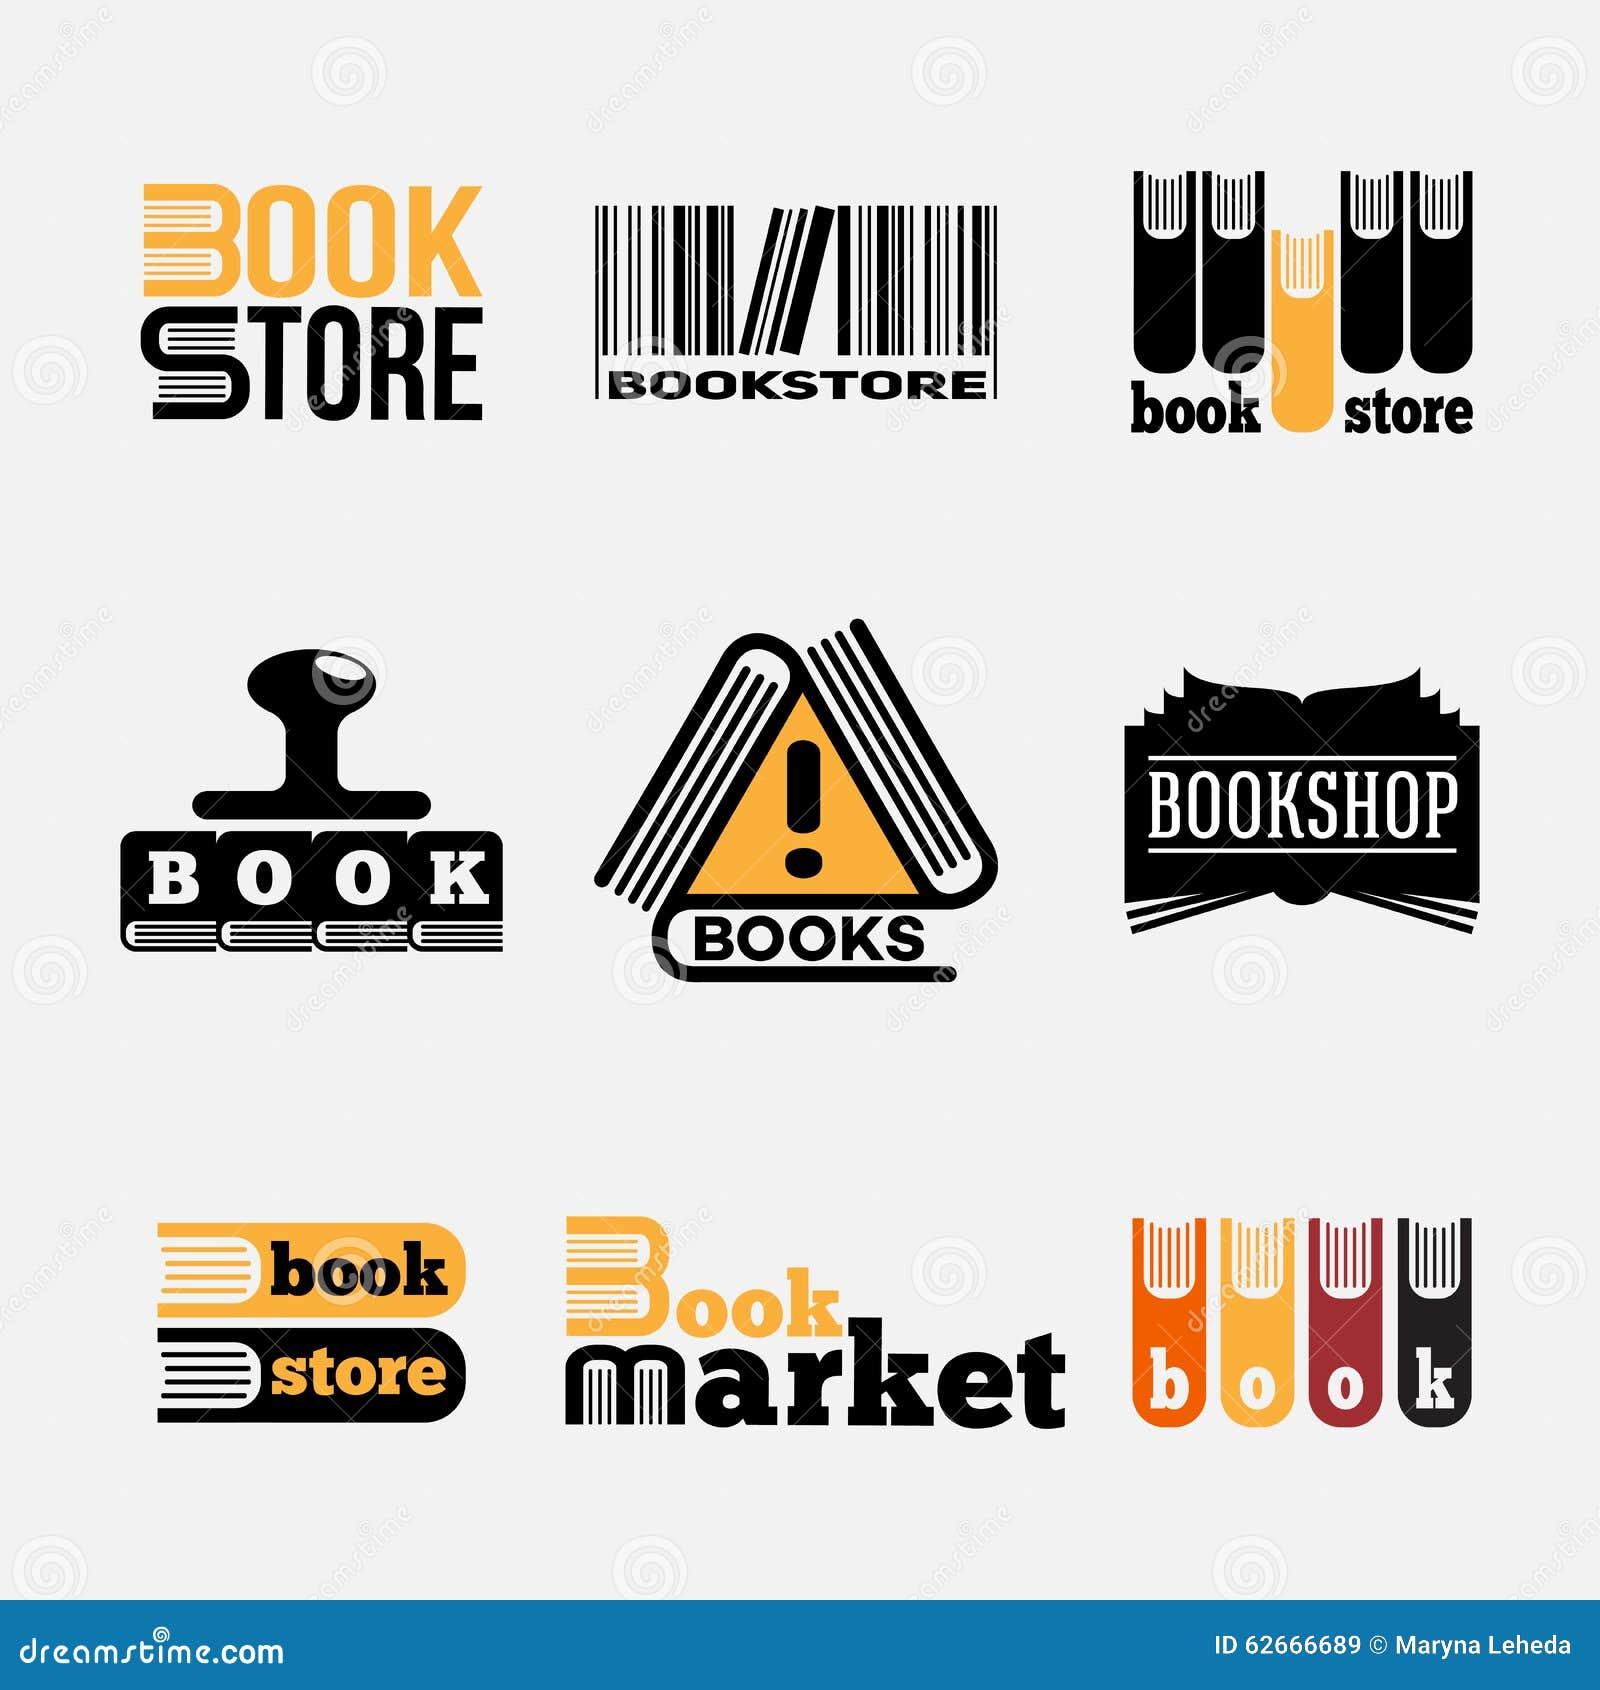 Book logos stock vector image 42714029 - Book Logos Royalty Free Stock Images